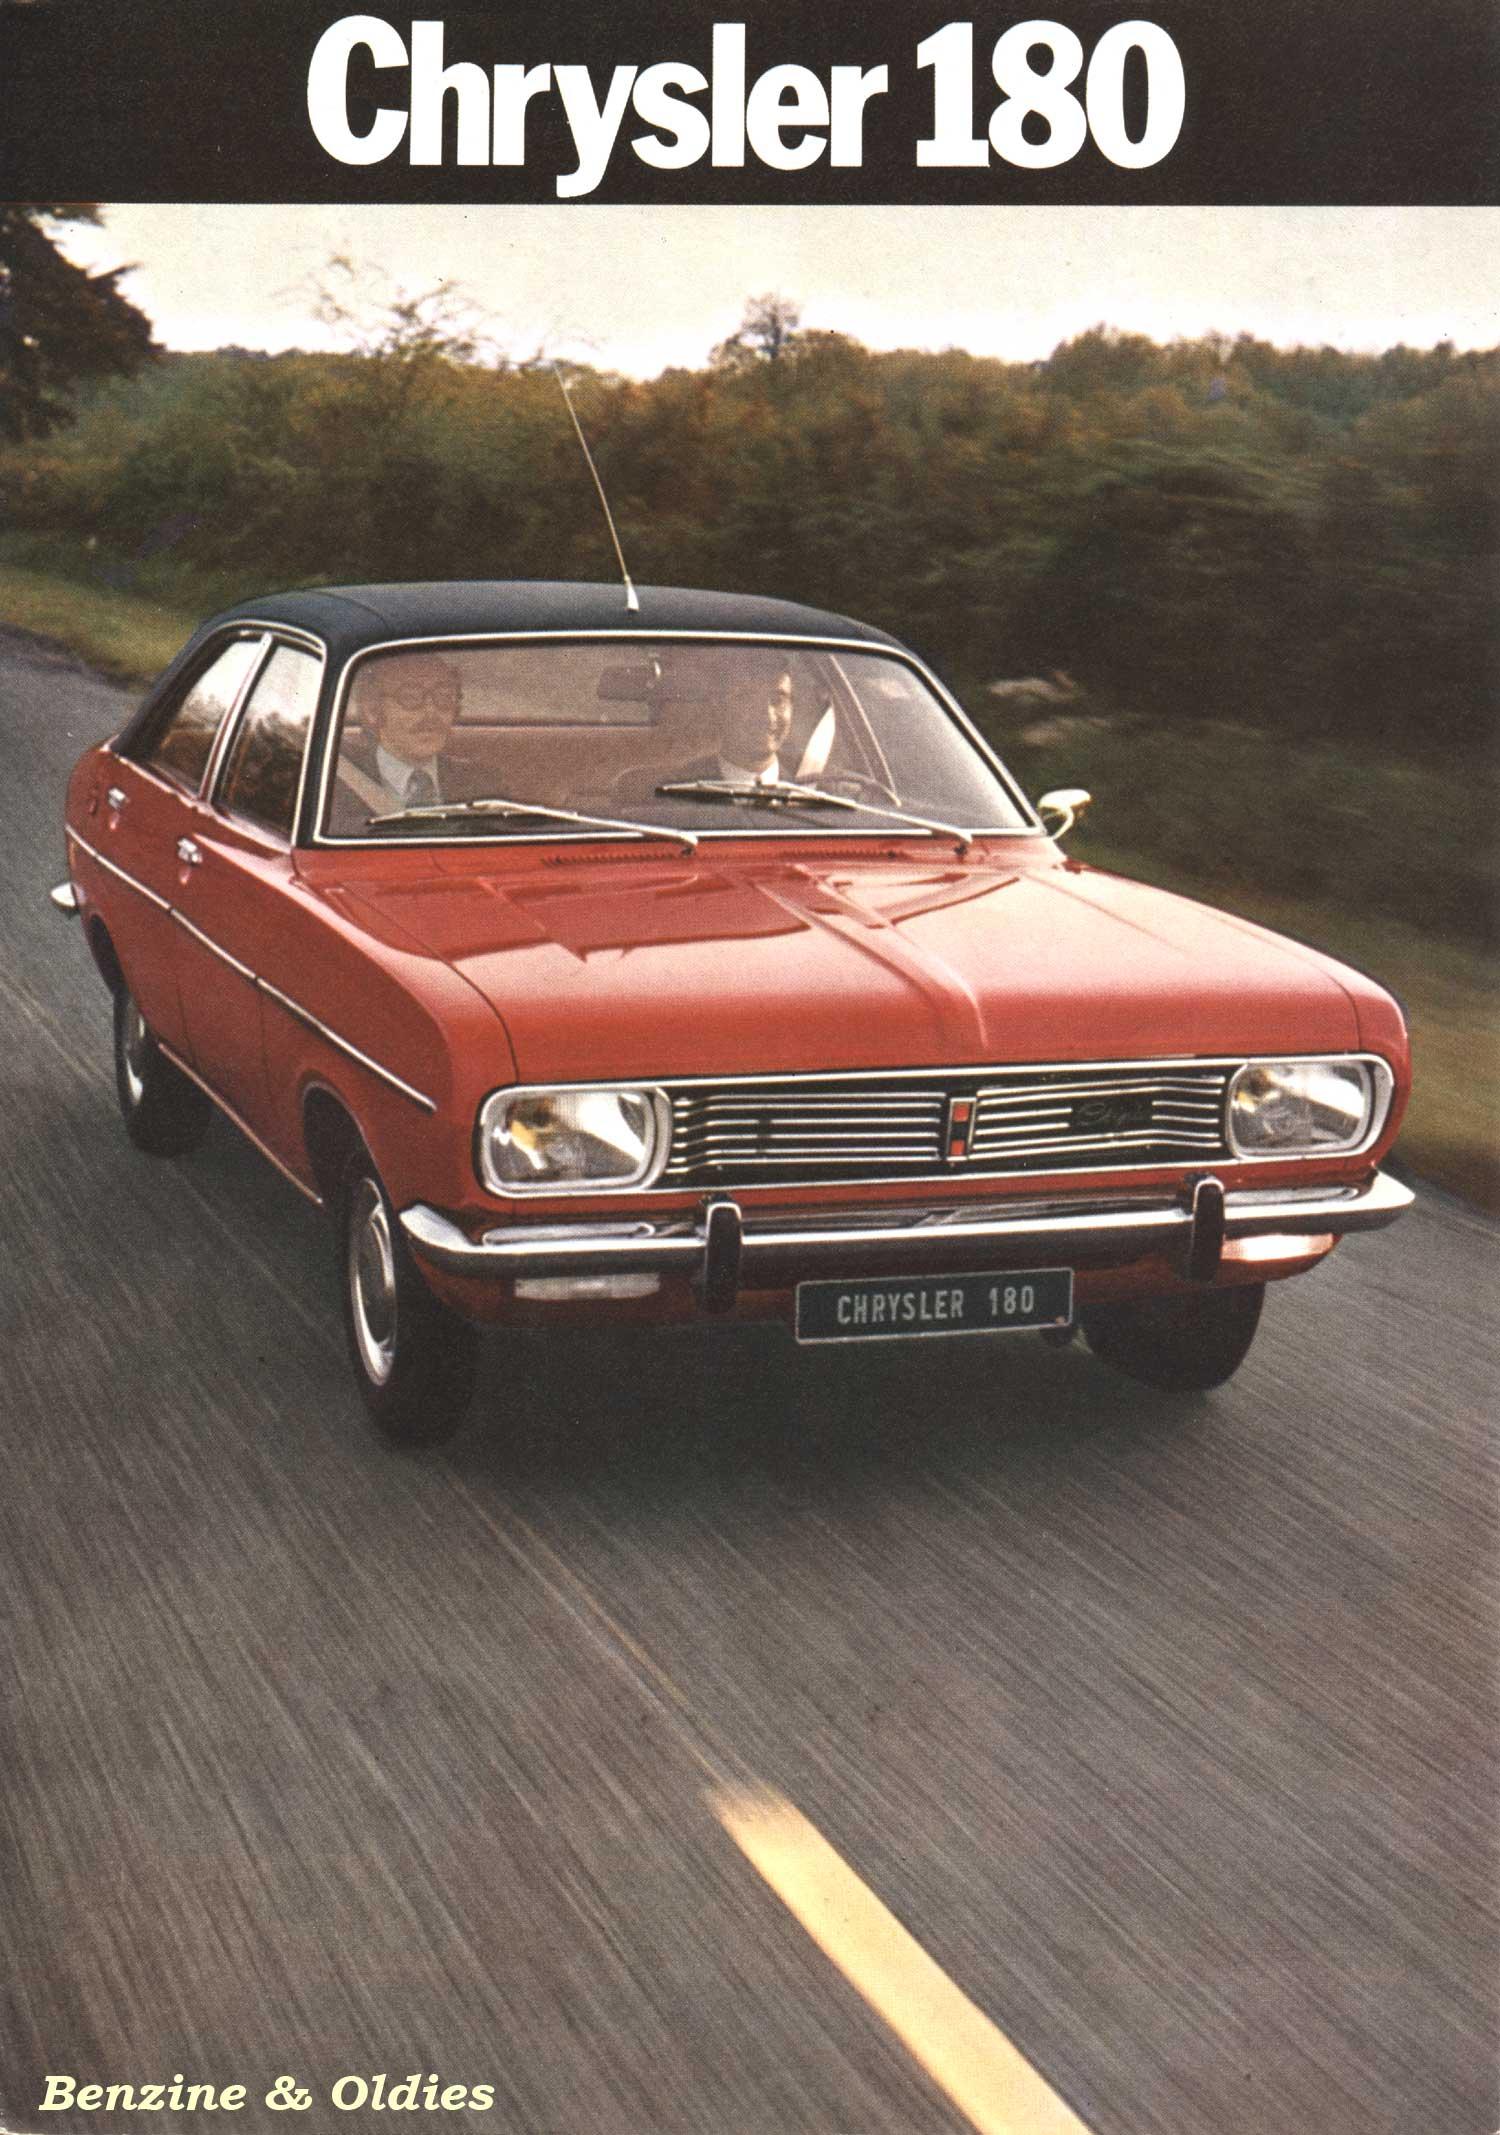 Chrysler 180 : catalogue 01 Chrysler_180_catalogue_01_p1_w1500